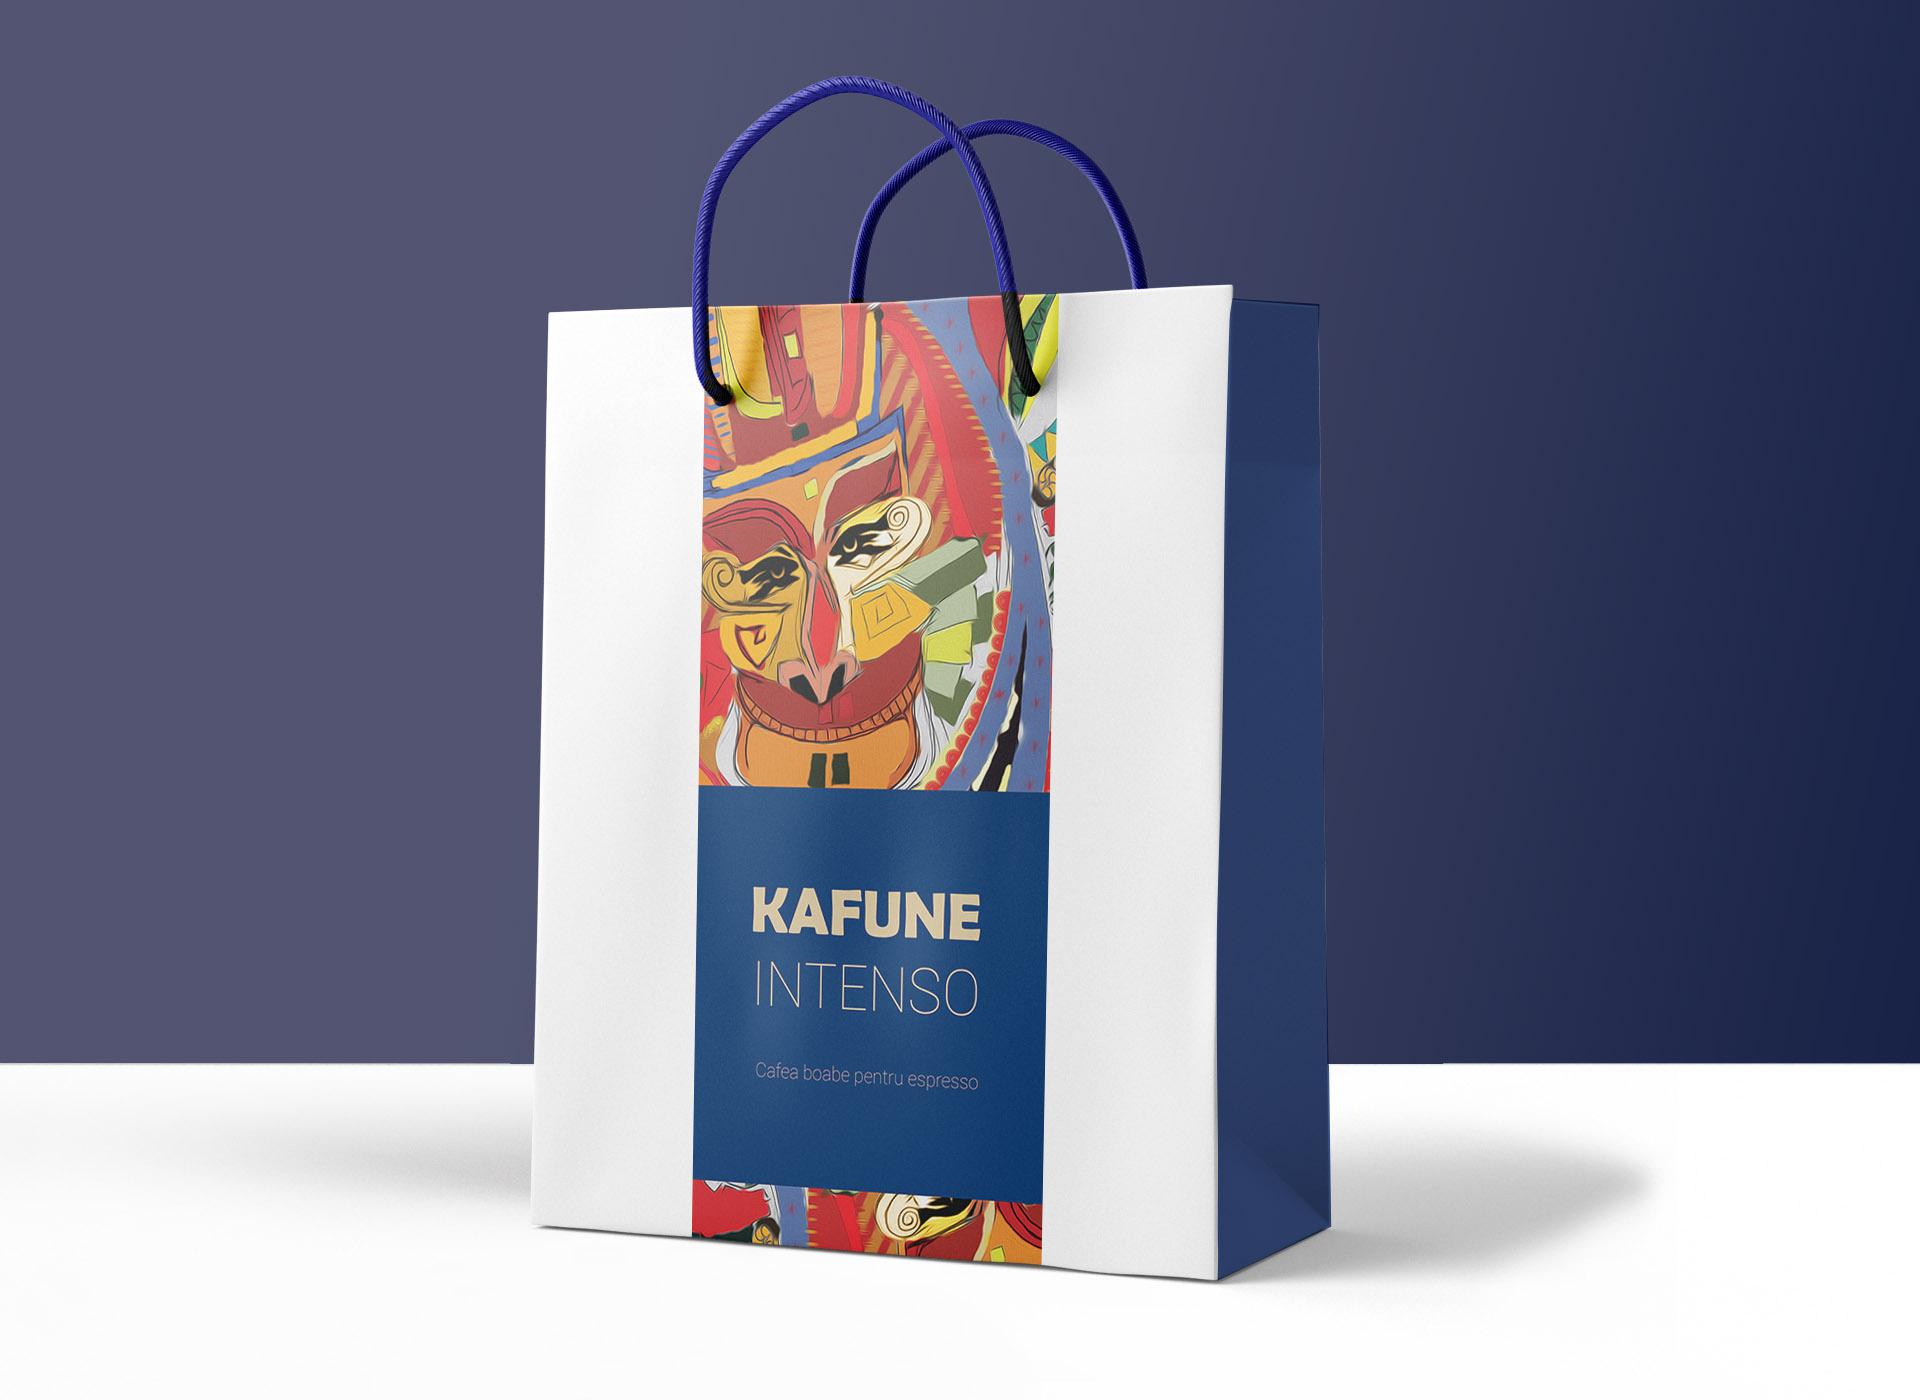 kafune portfolio inoveo bag